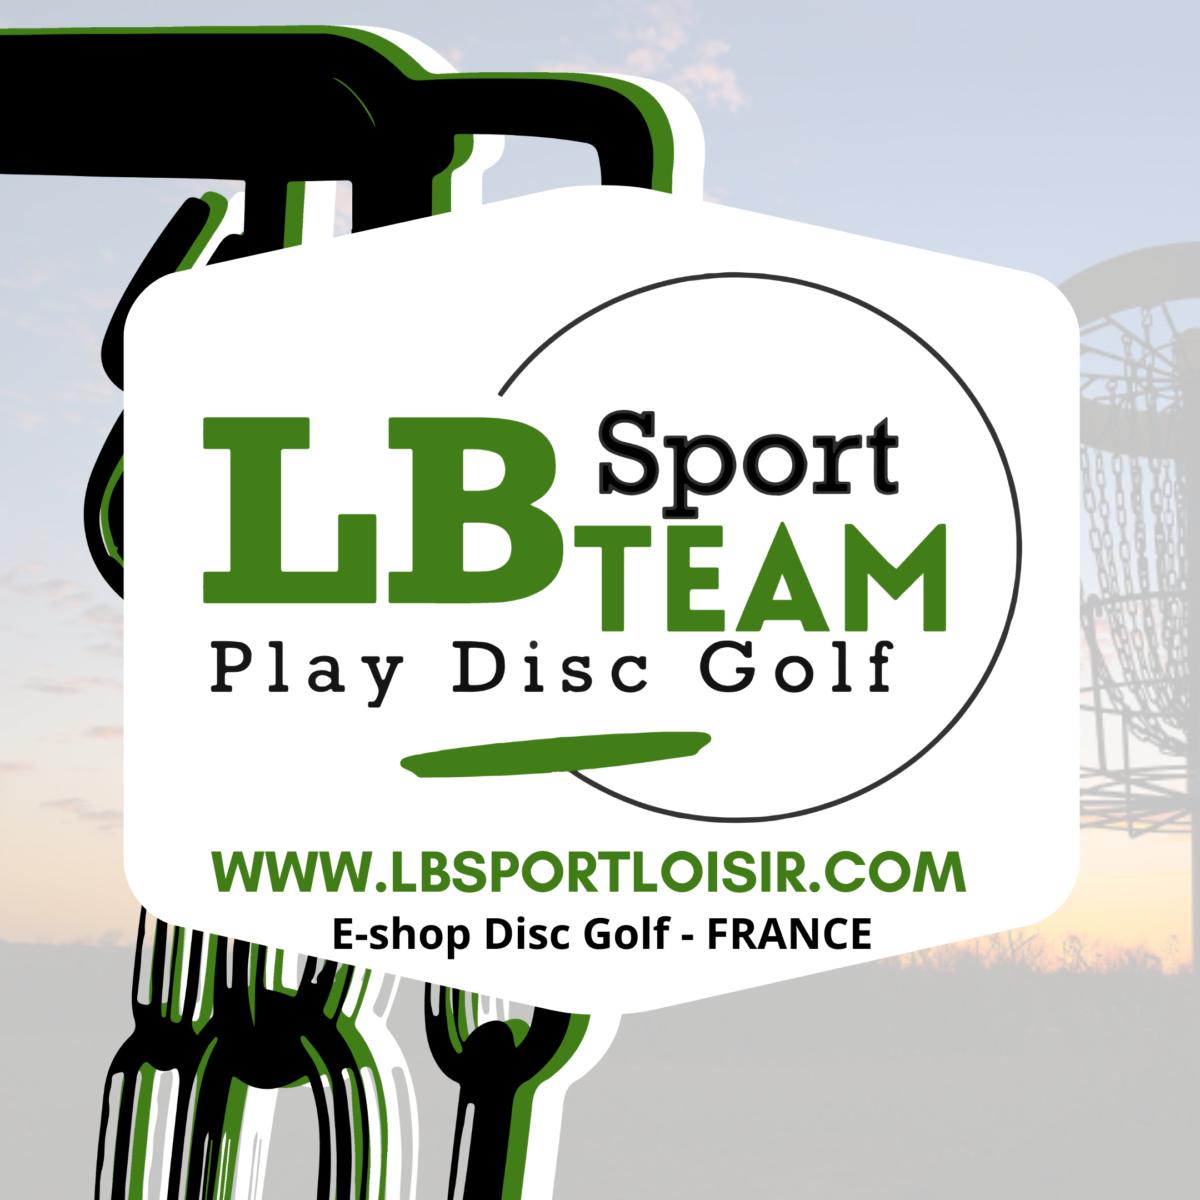 La TEAM LB Sport PLAY DISC GOLF est née !